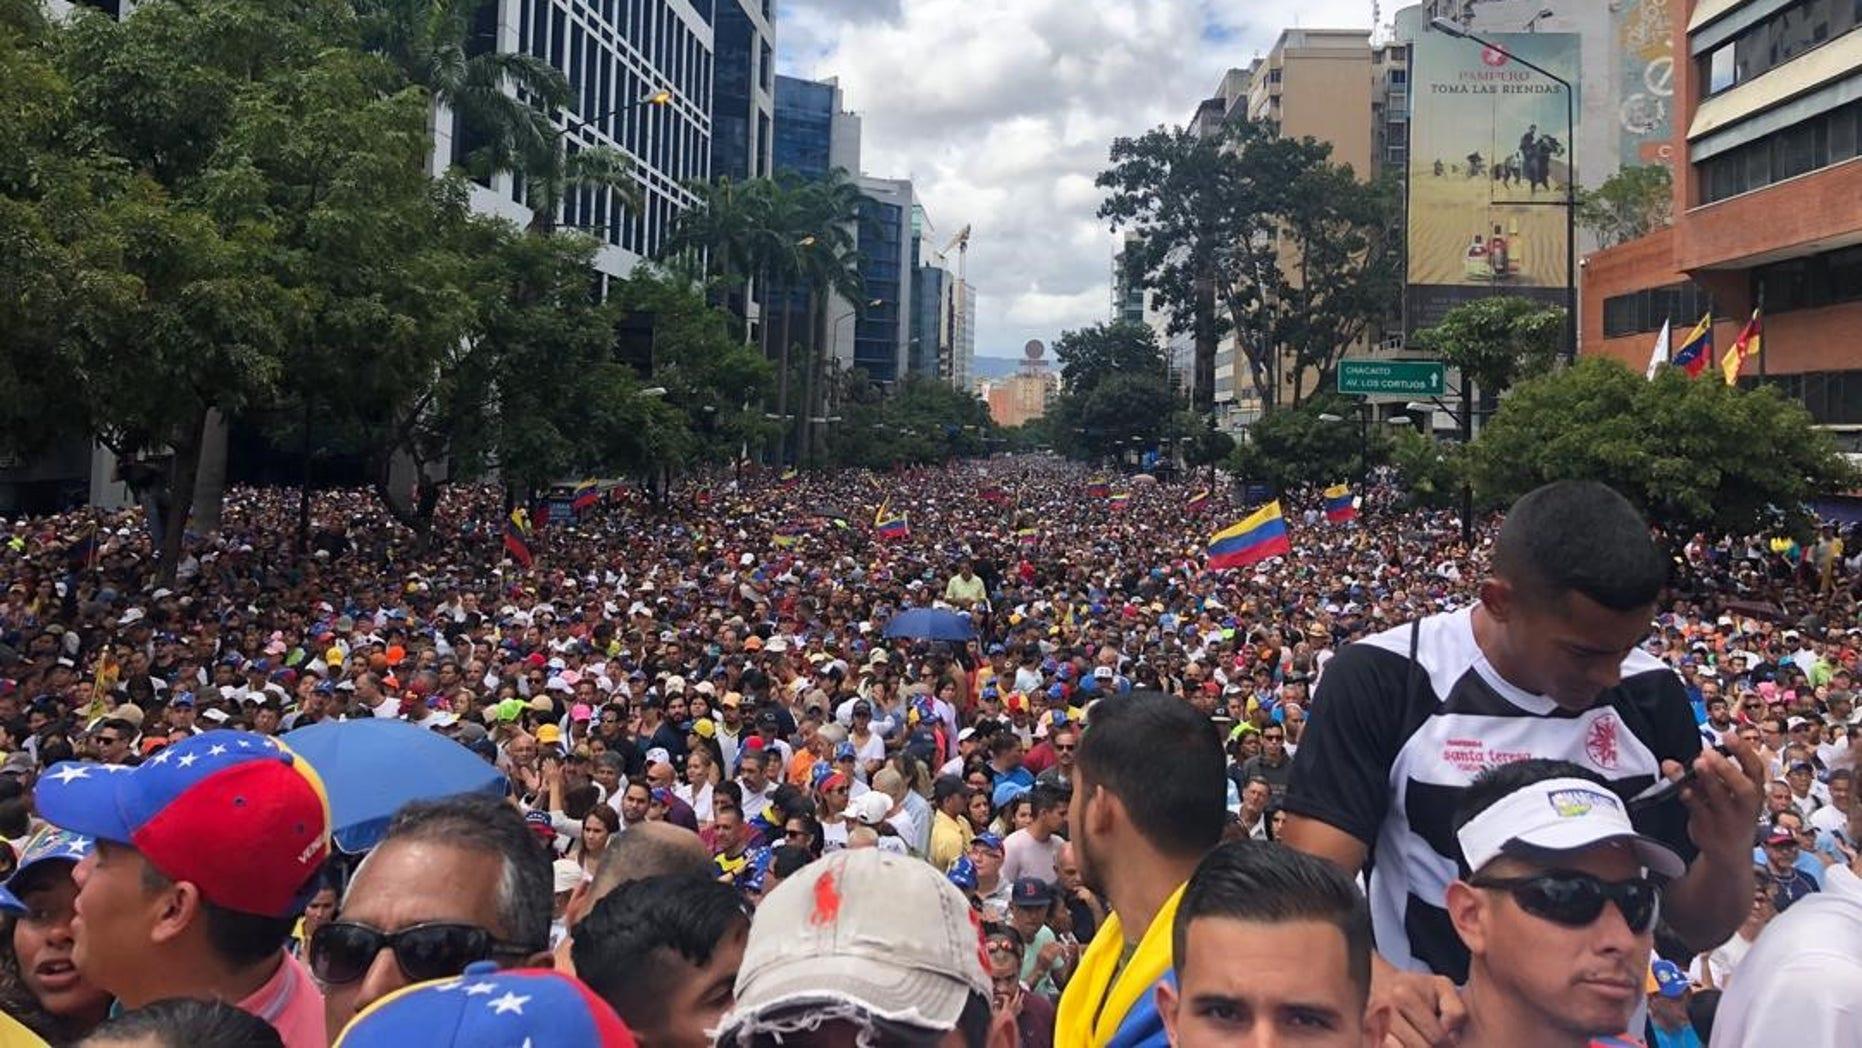 Protests against the Nicolas Maduro regime in Caracas Venezuela on Wednesday Jan 23 2019